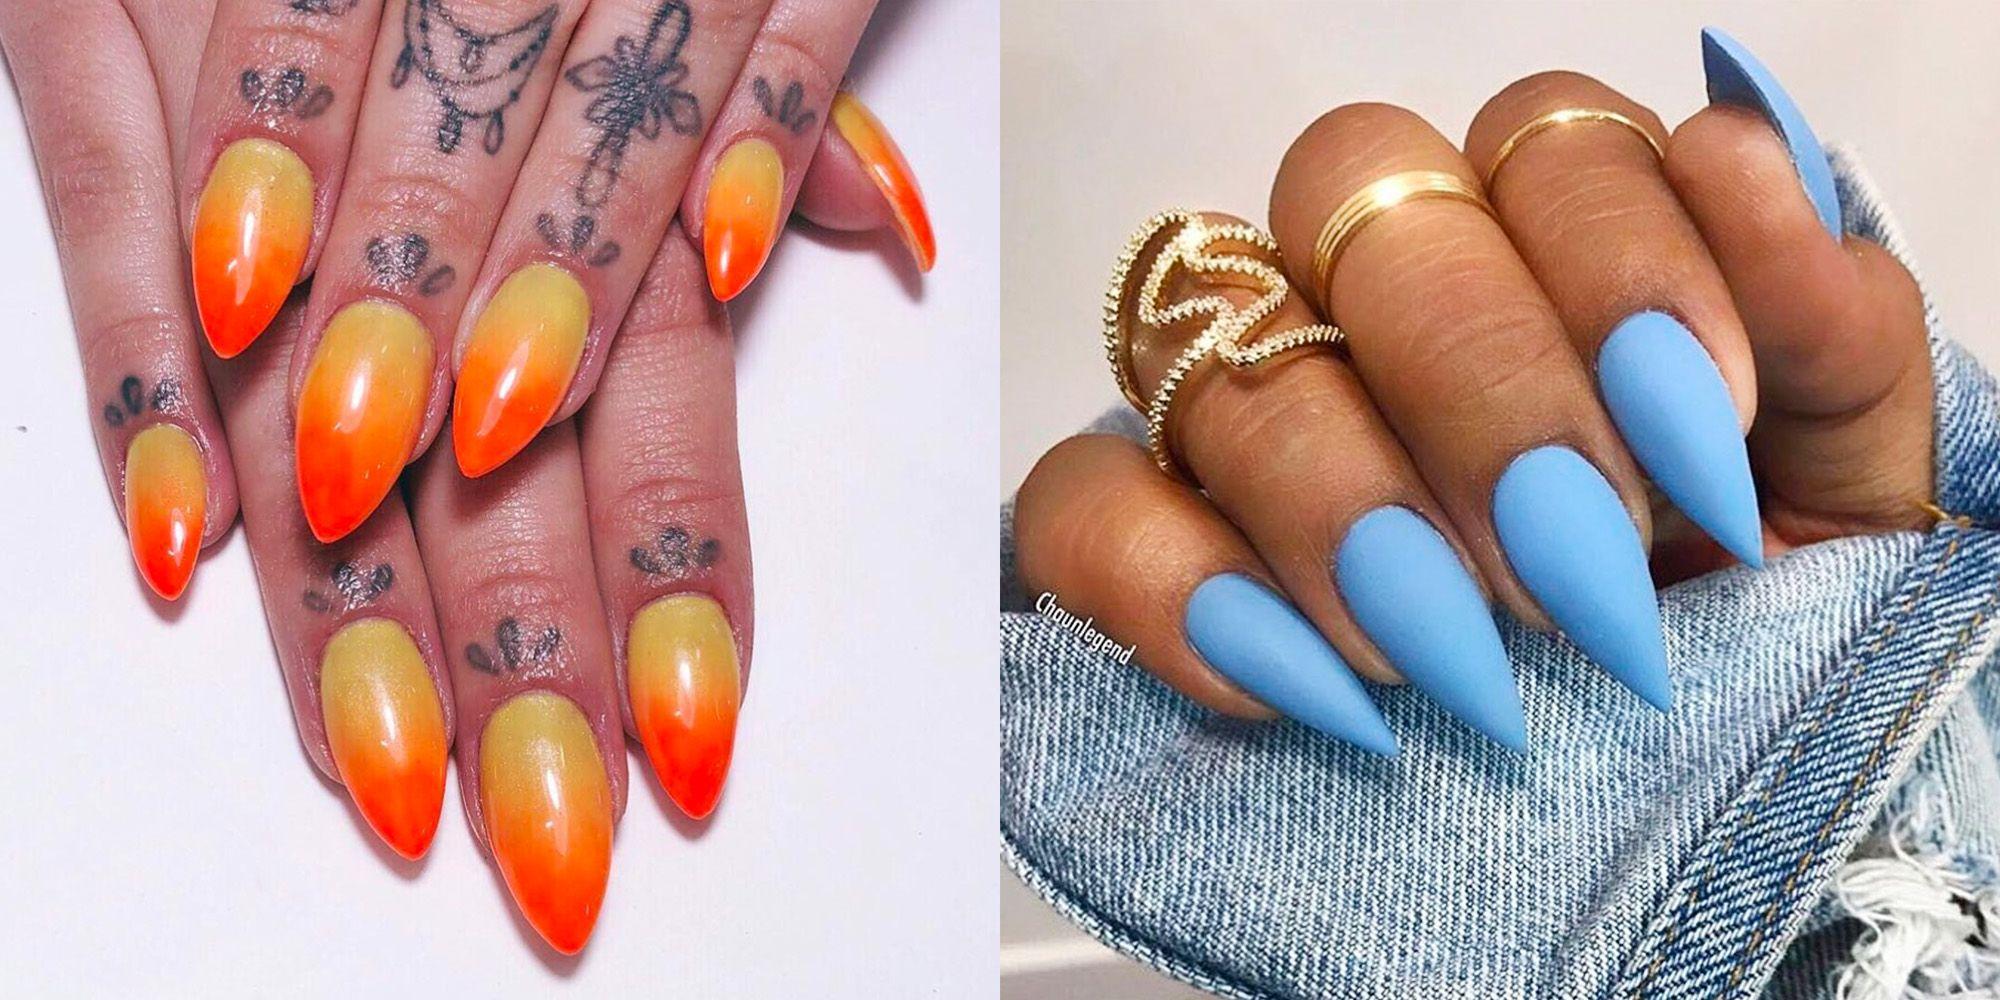 10 Best Stiletto Nails Designs 2018 Pointy Stiletto Acrylic Nail Ideas